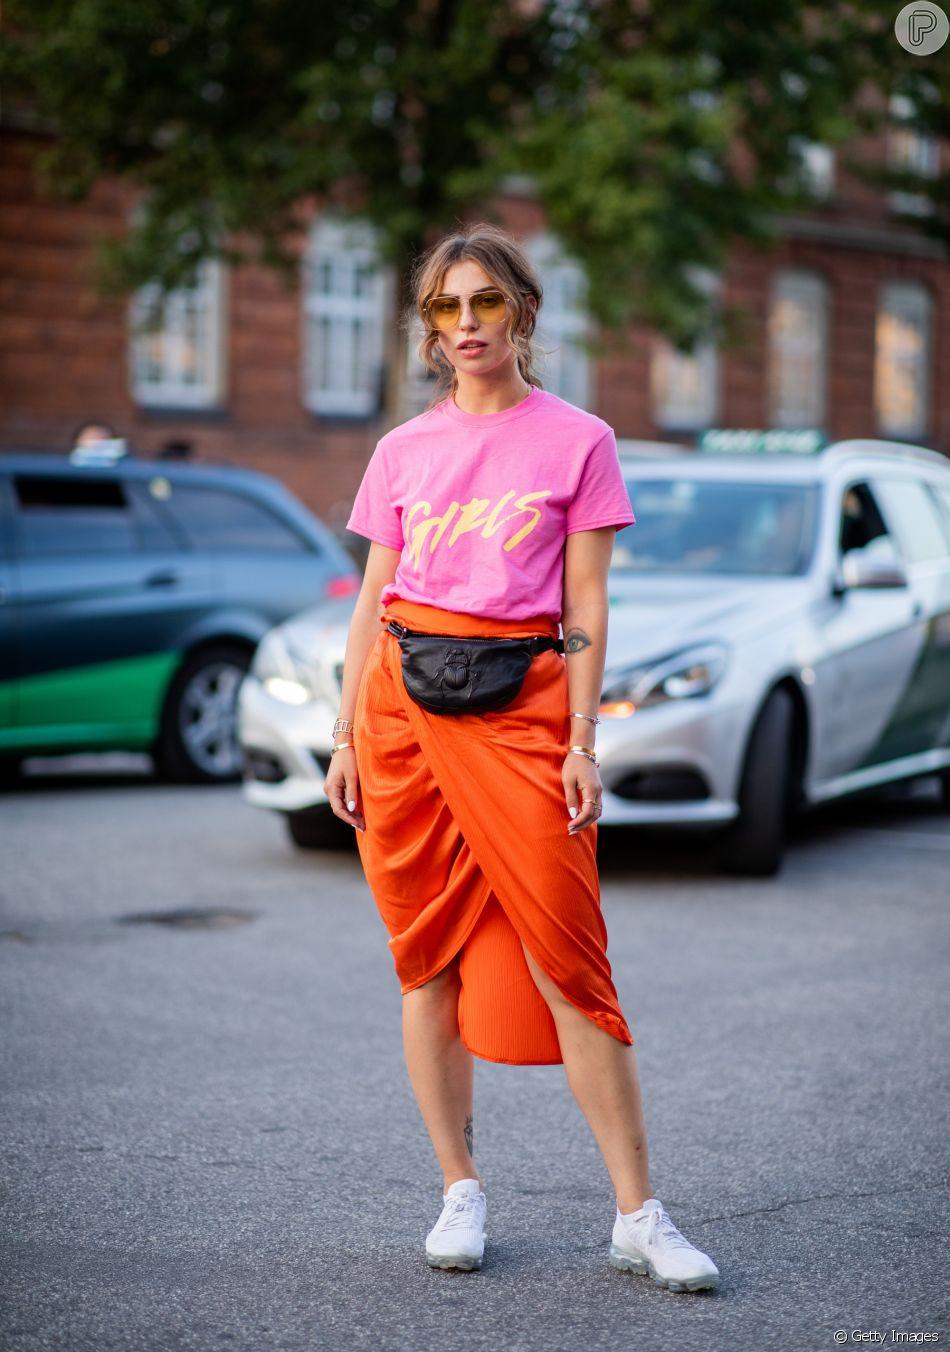 Combinando rosa e laranja: o duo saia + camiseta é rápido e fácil